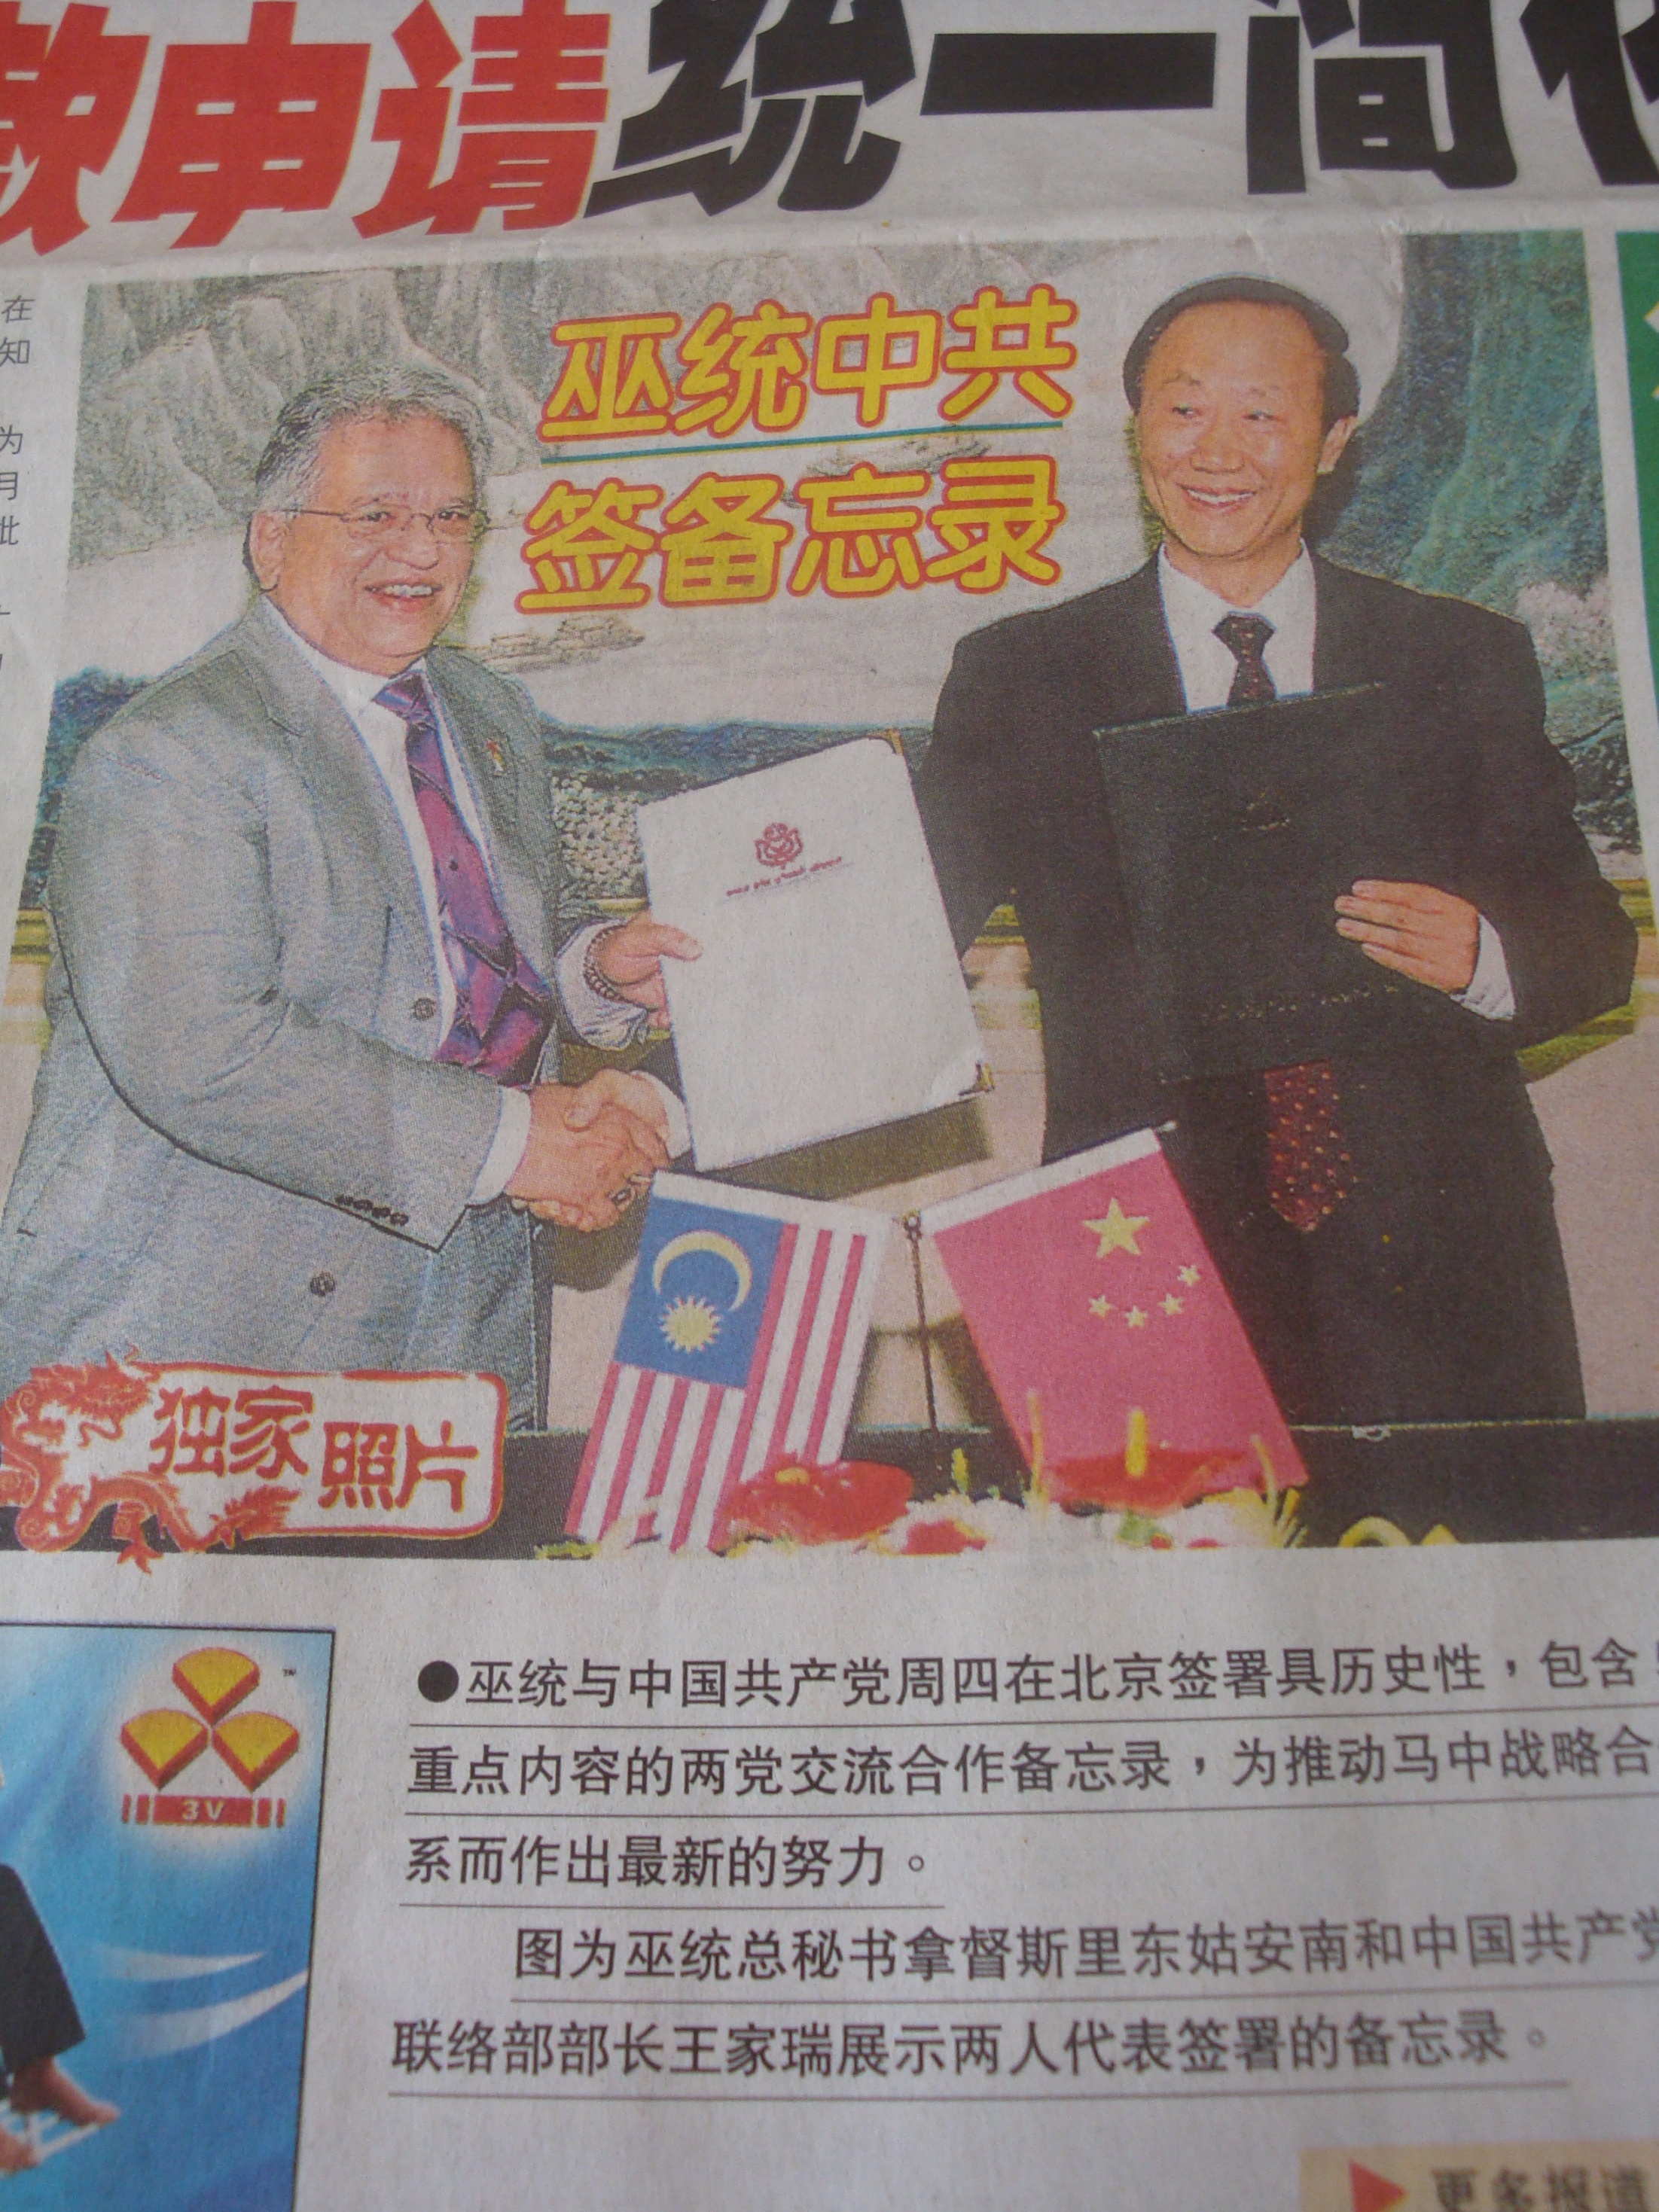 http://roketkini.com/wp-content/uploads/2011/09/umno-komunis-china.jpg